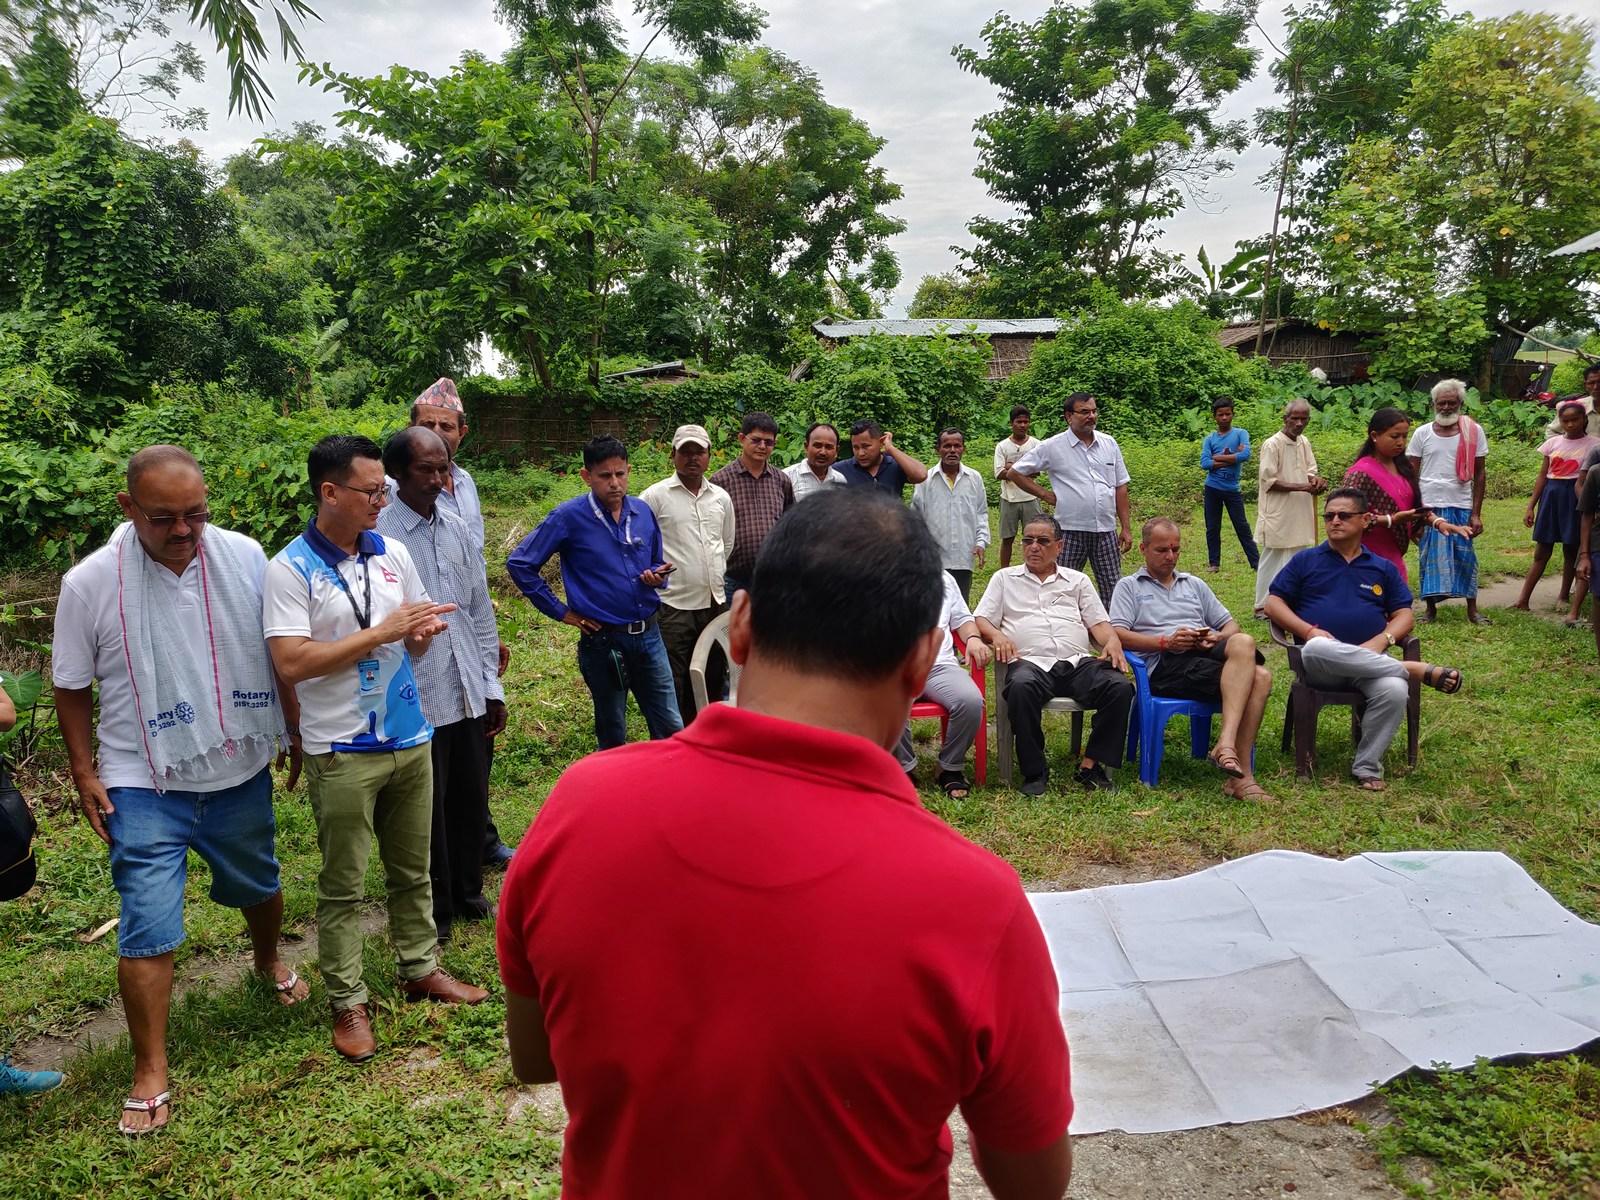 Free-Health-Camp-Eye-Screening-at-Gwala-Basti-Mechinagar-15-Jhapa-Nepal-Rotary-Club-of-Kakarvitta-13